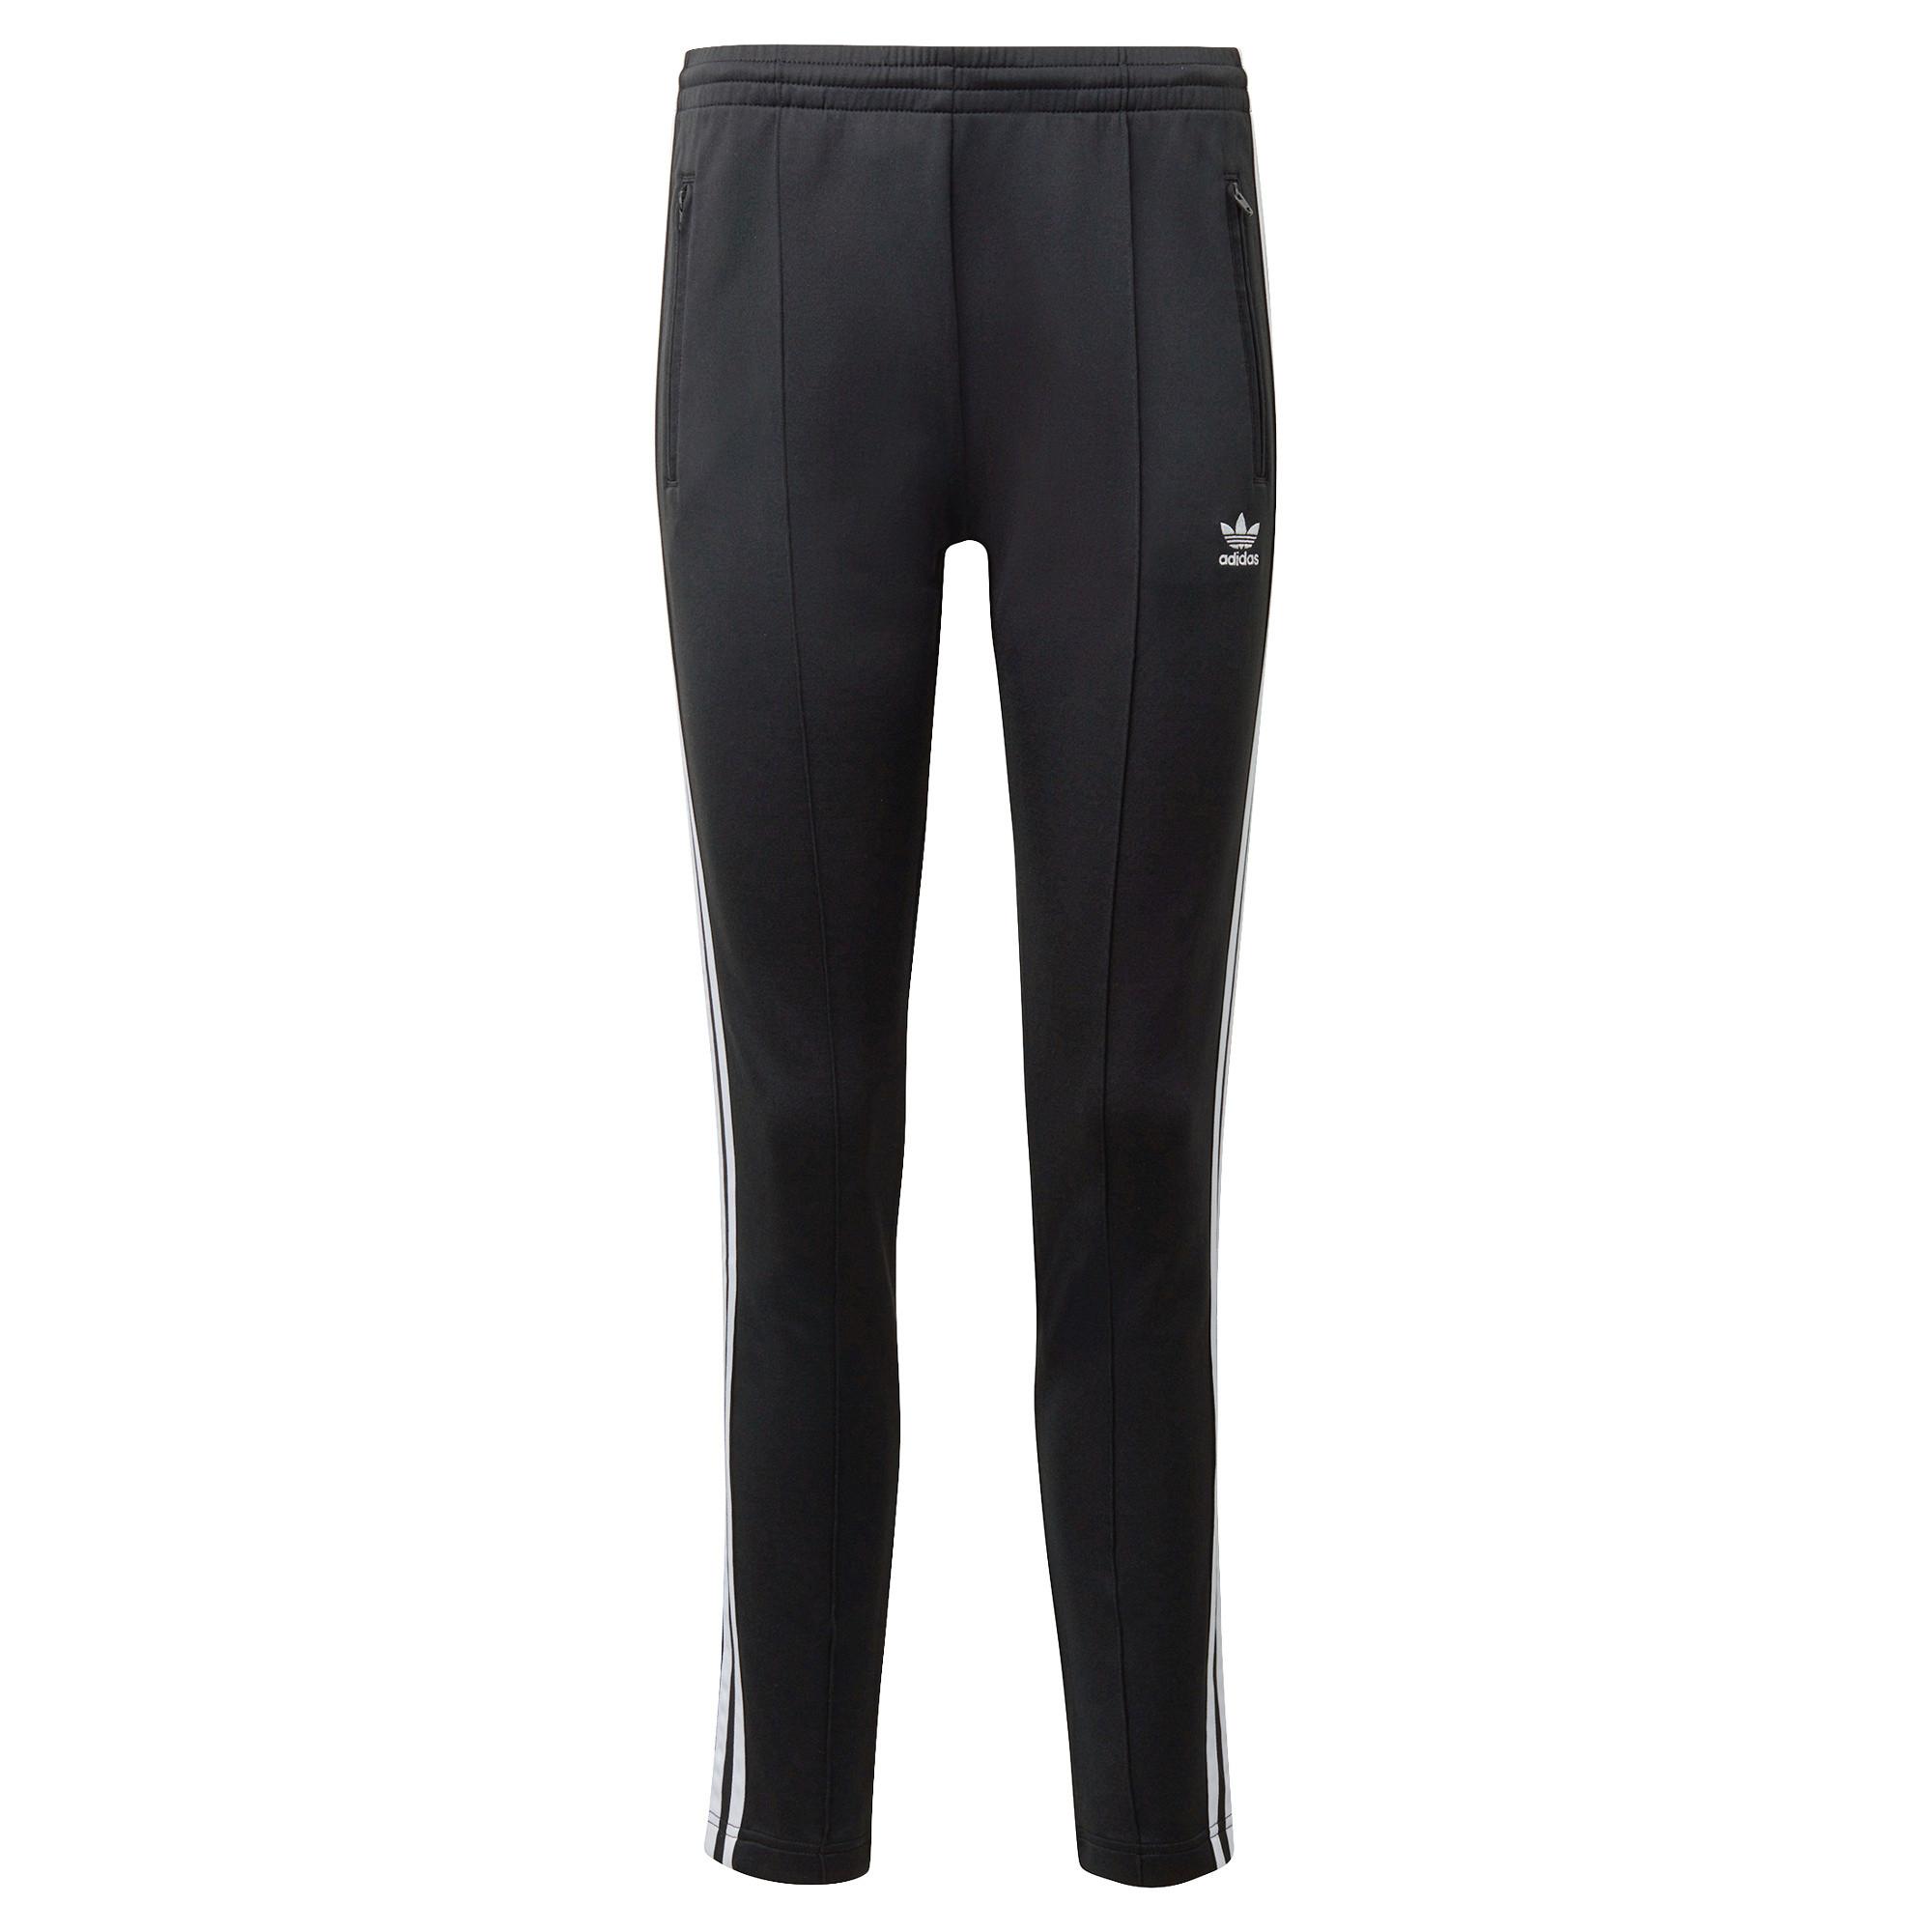 Pantaloni tuta Primeblue SST, Bianco/Nero, large image number 0